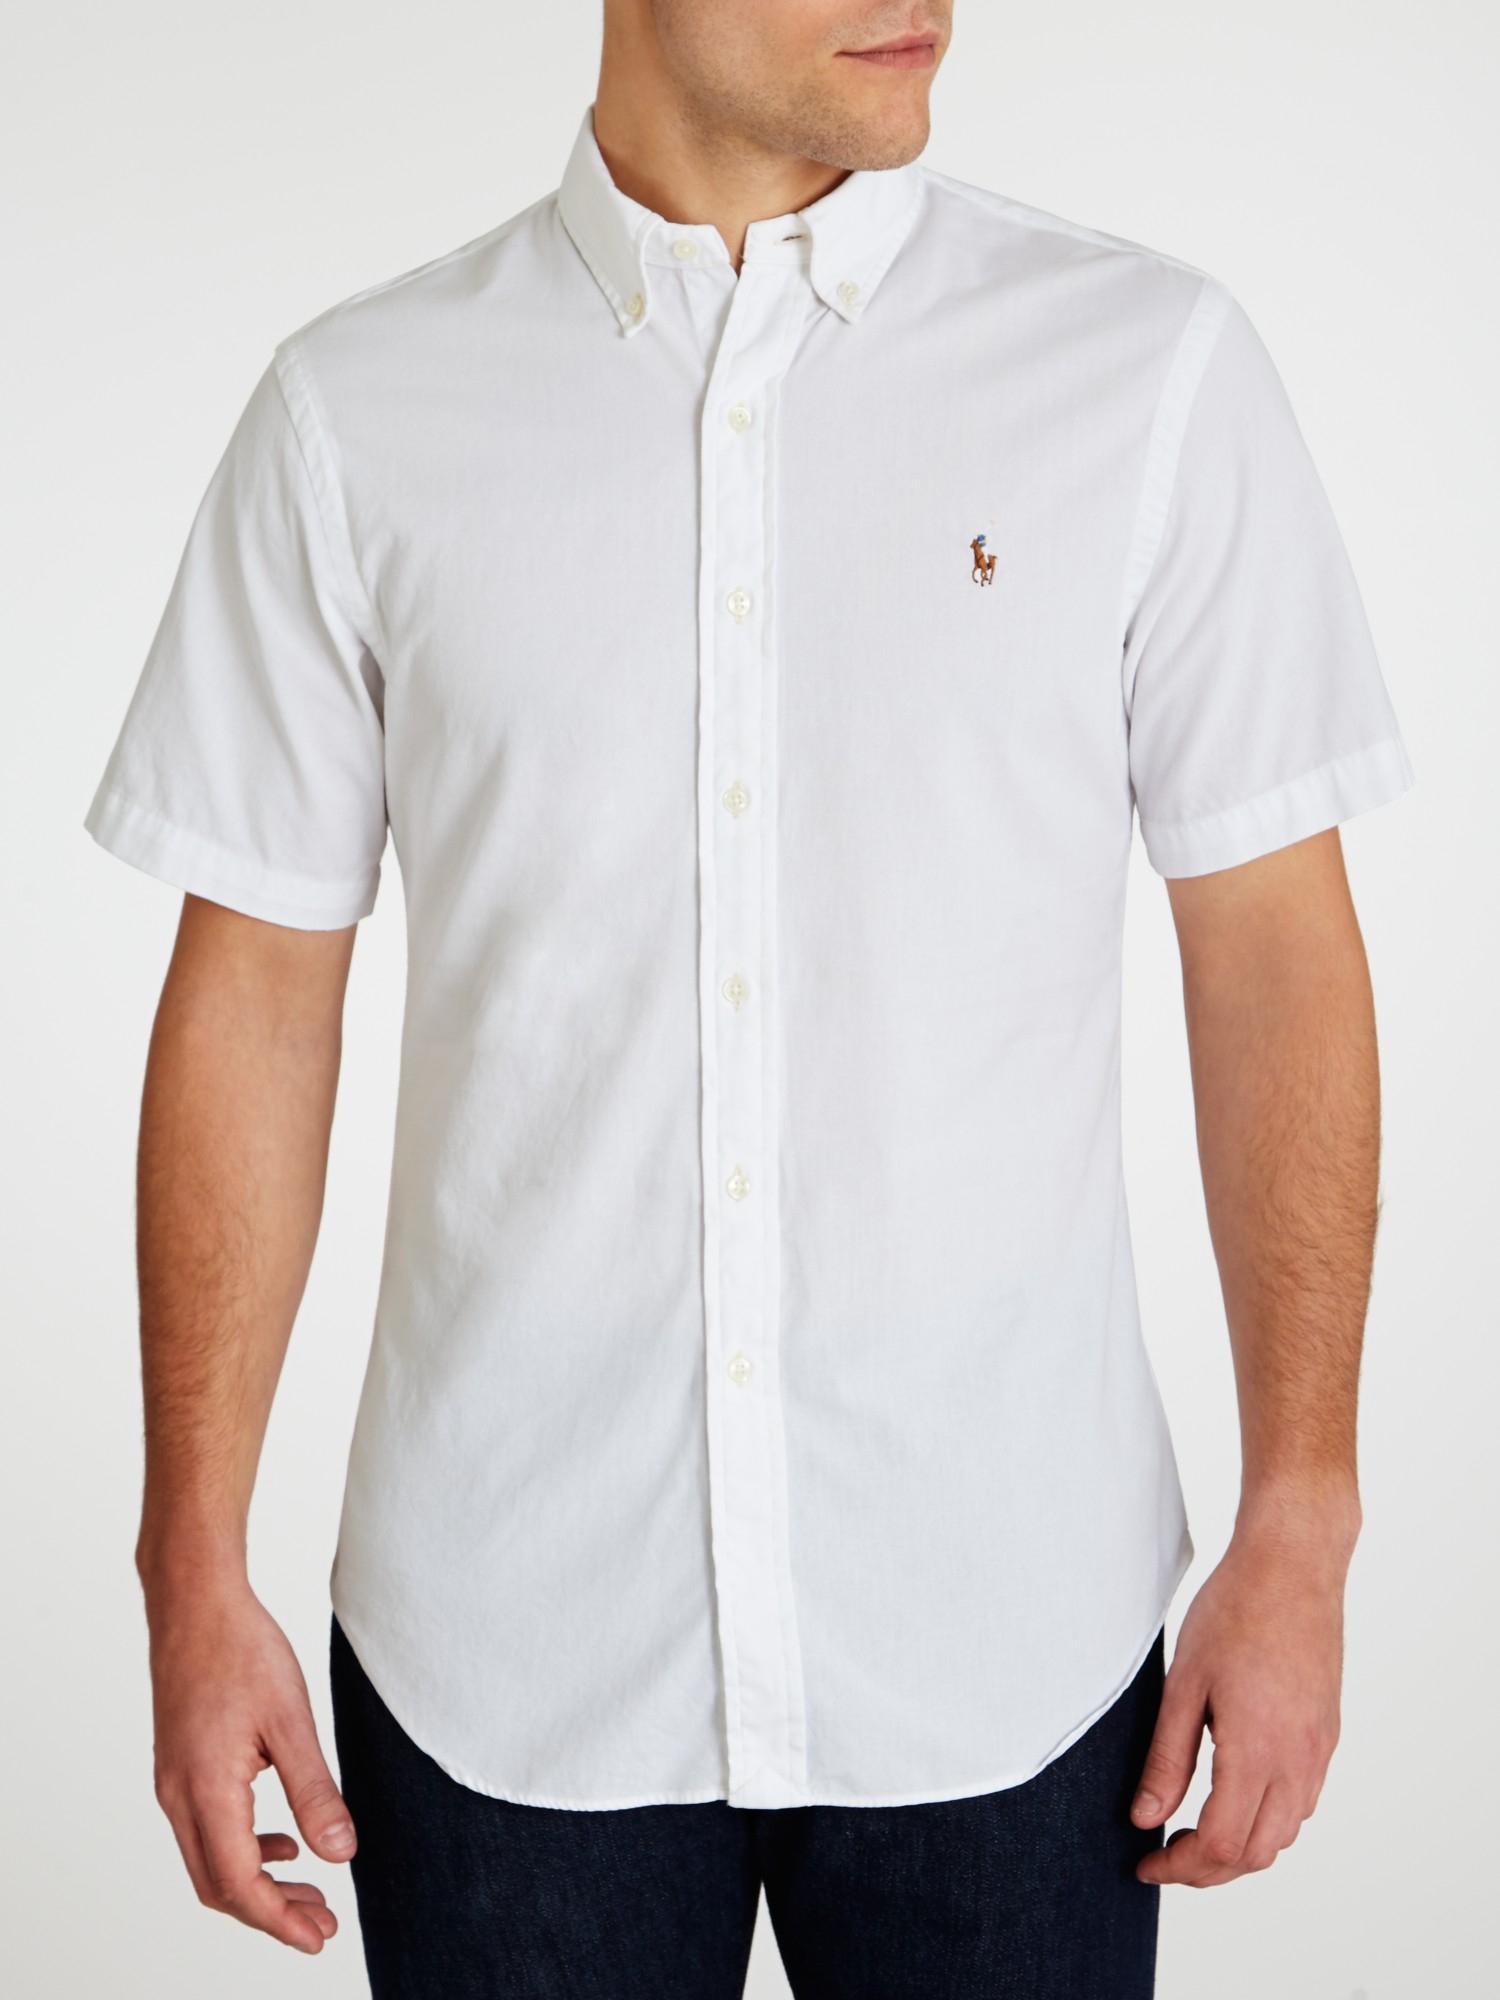 Ralph lauren polos on sale for women men s ralph lauren for Polo shirts for men on sale